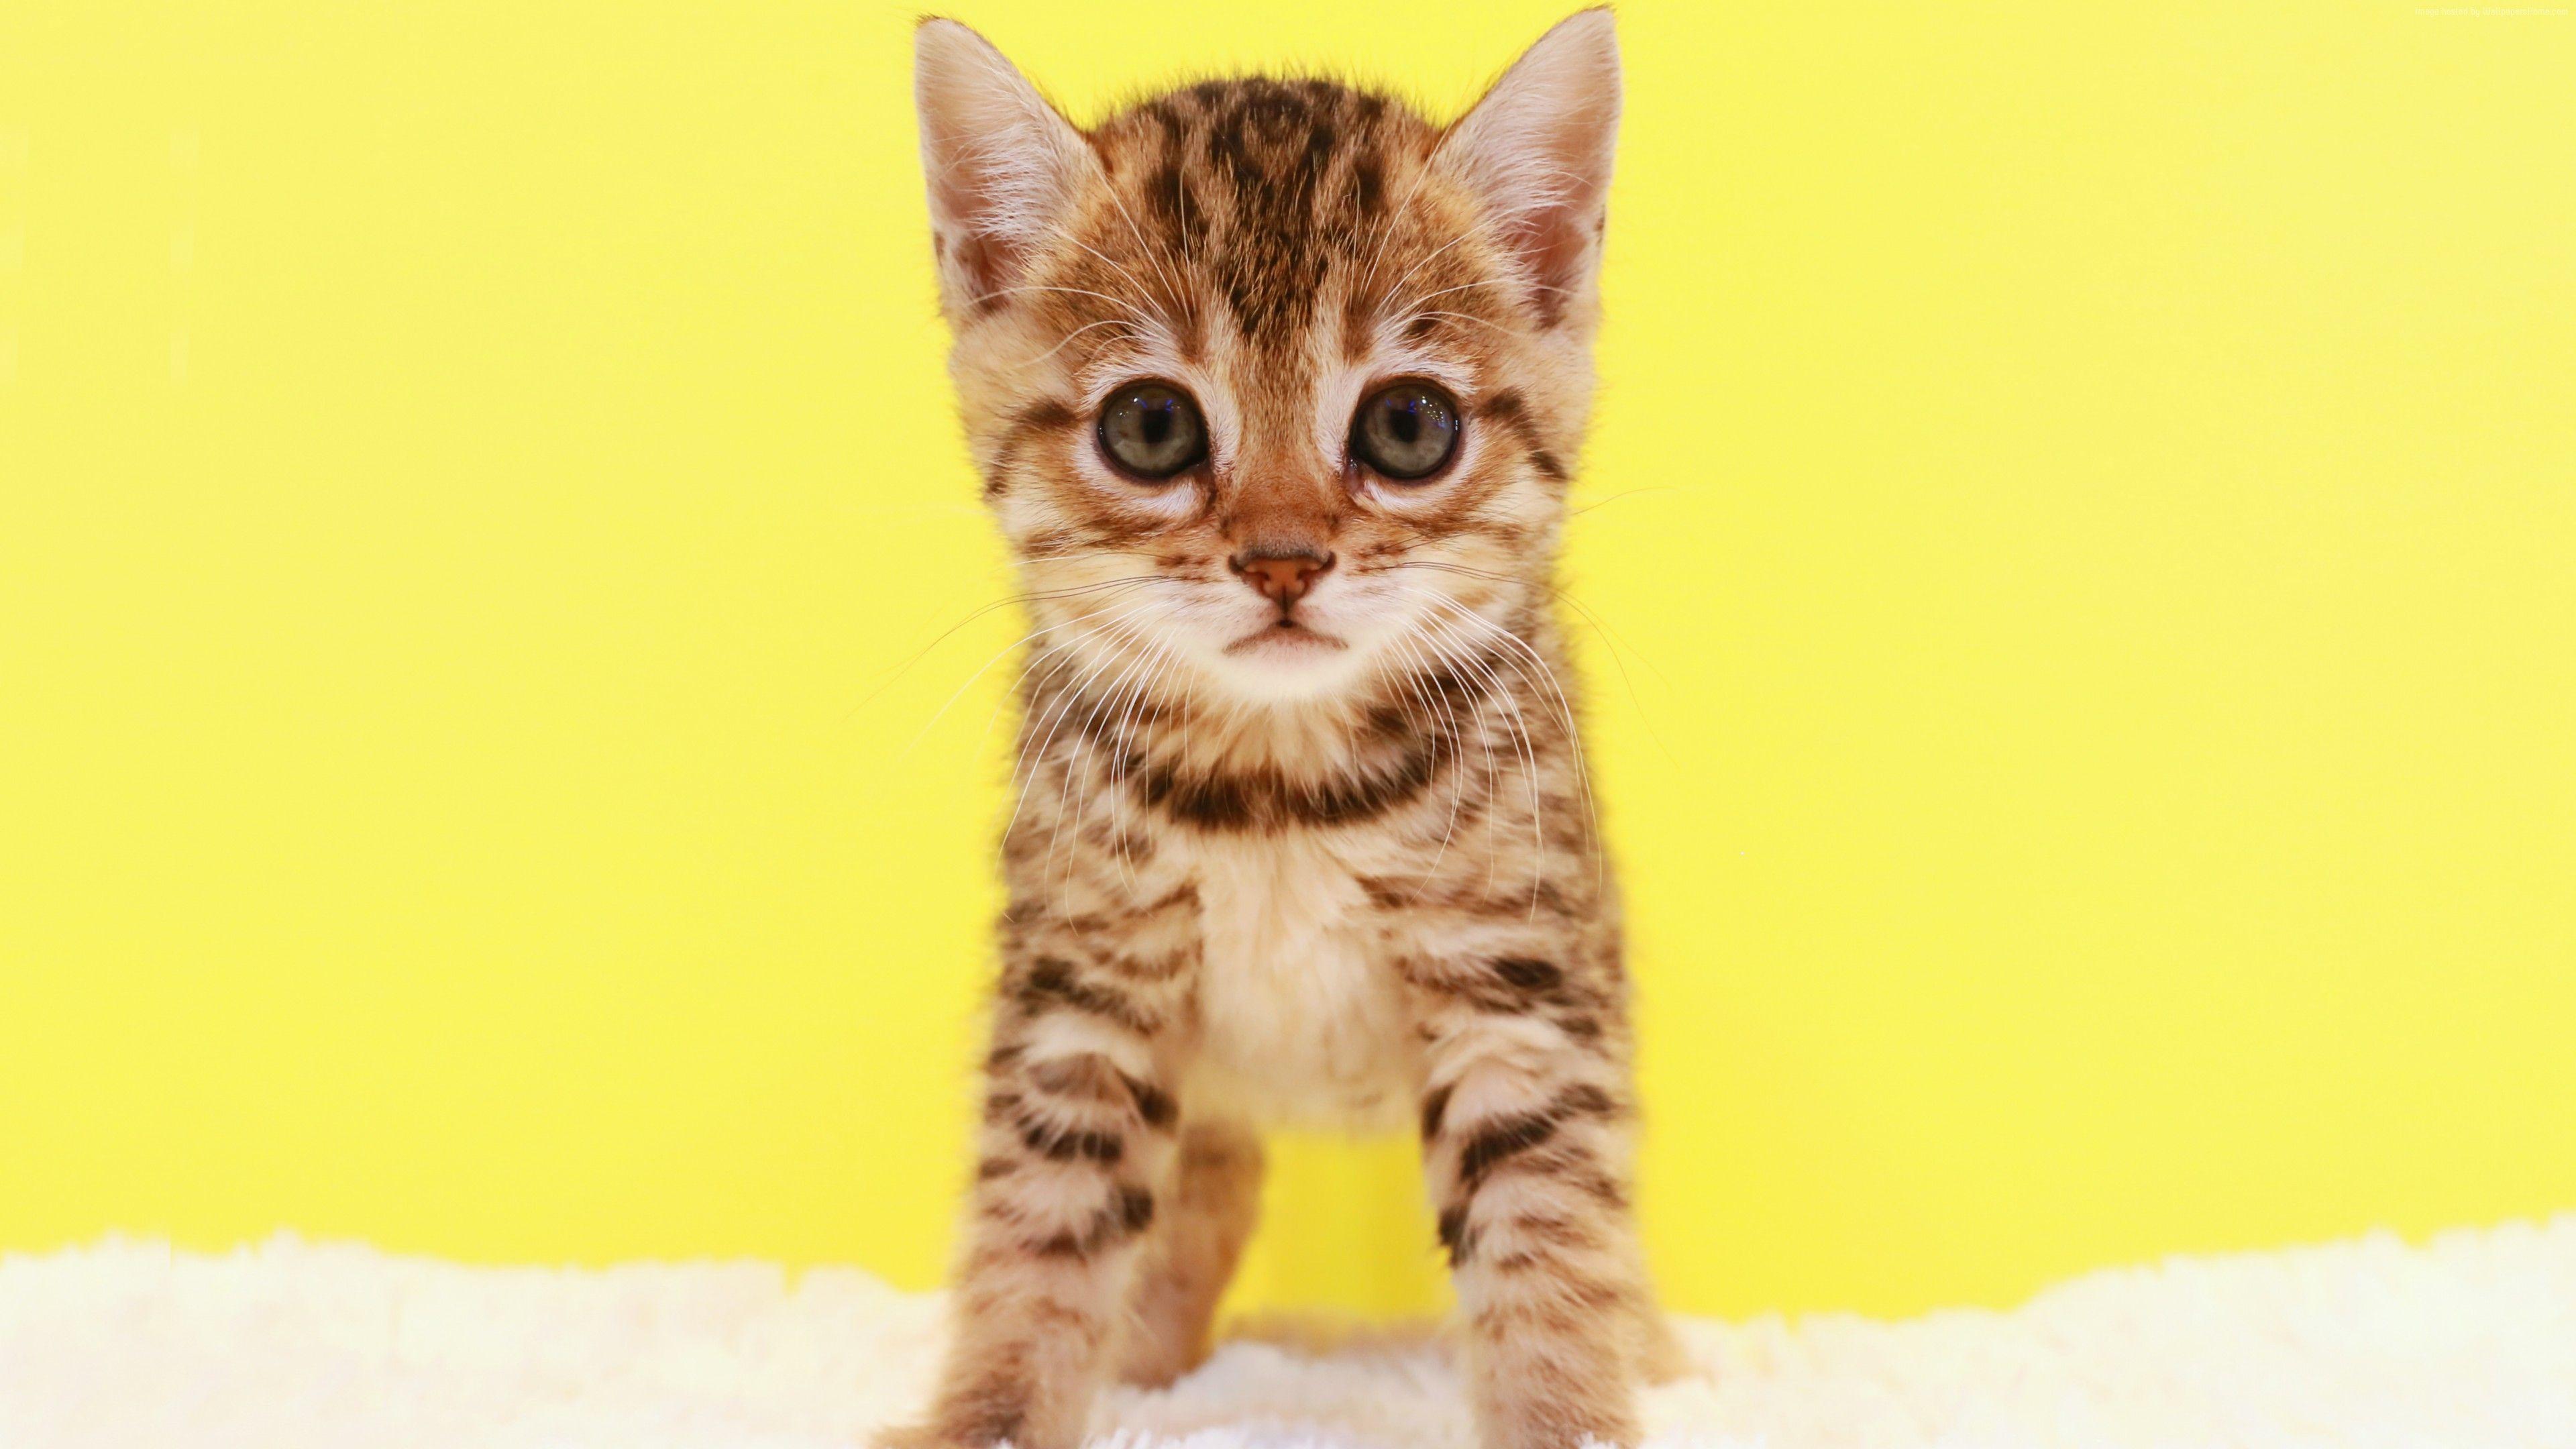 Wallpaper Kitten Cat Cute 5k Animals Https Www Pxwall Com Wallpaper Kitten Cat Cute 5k Animals Animals Kitten Cats